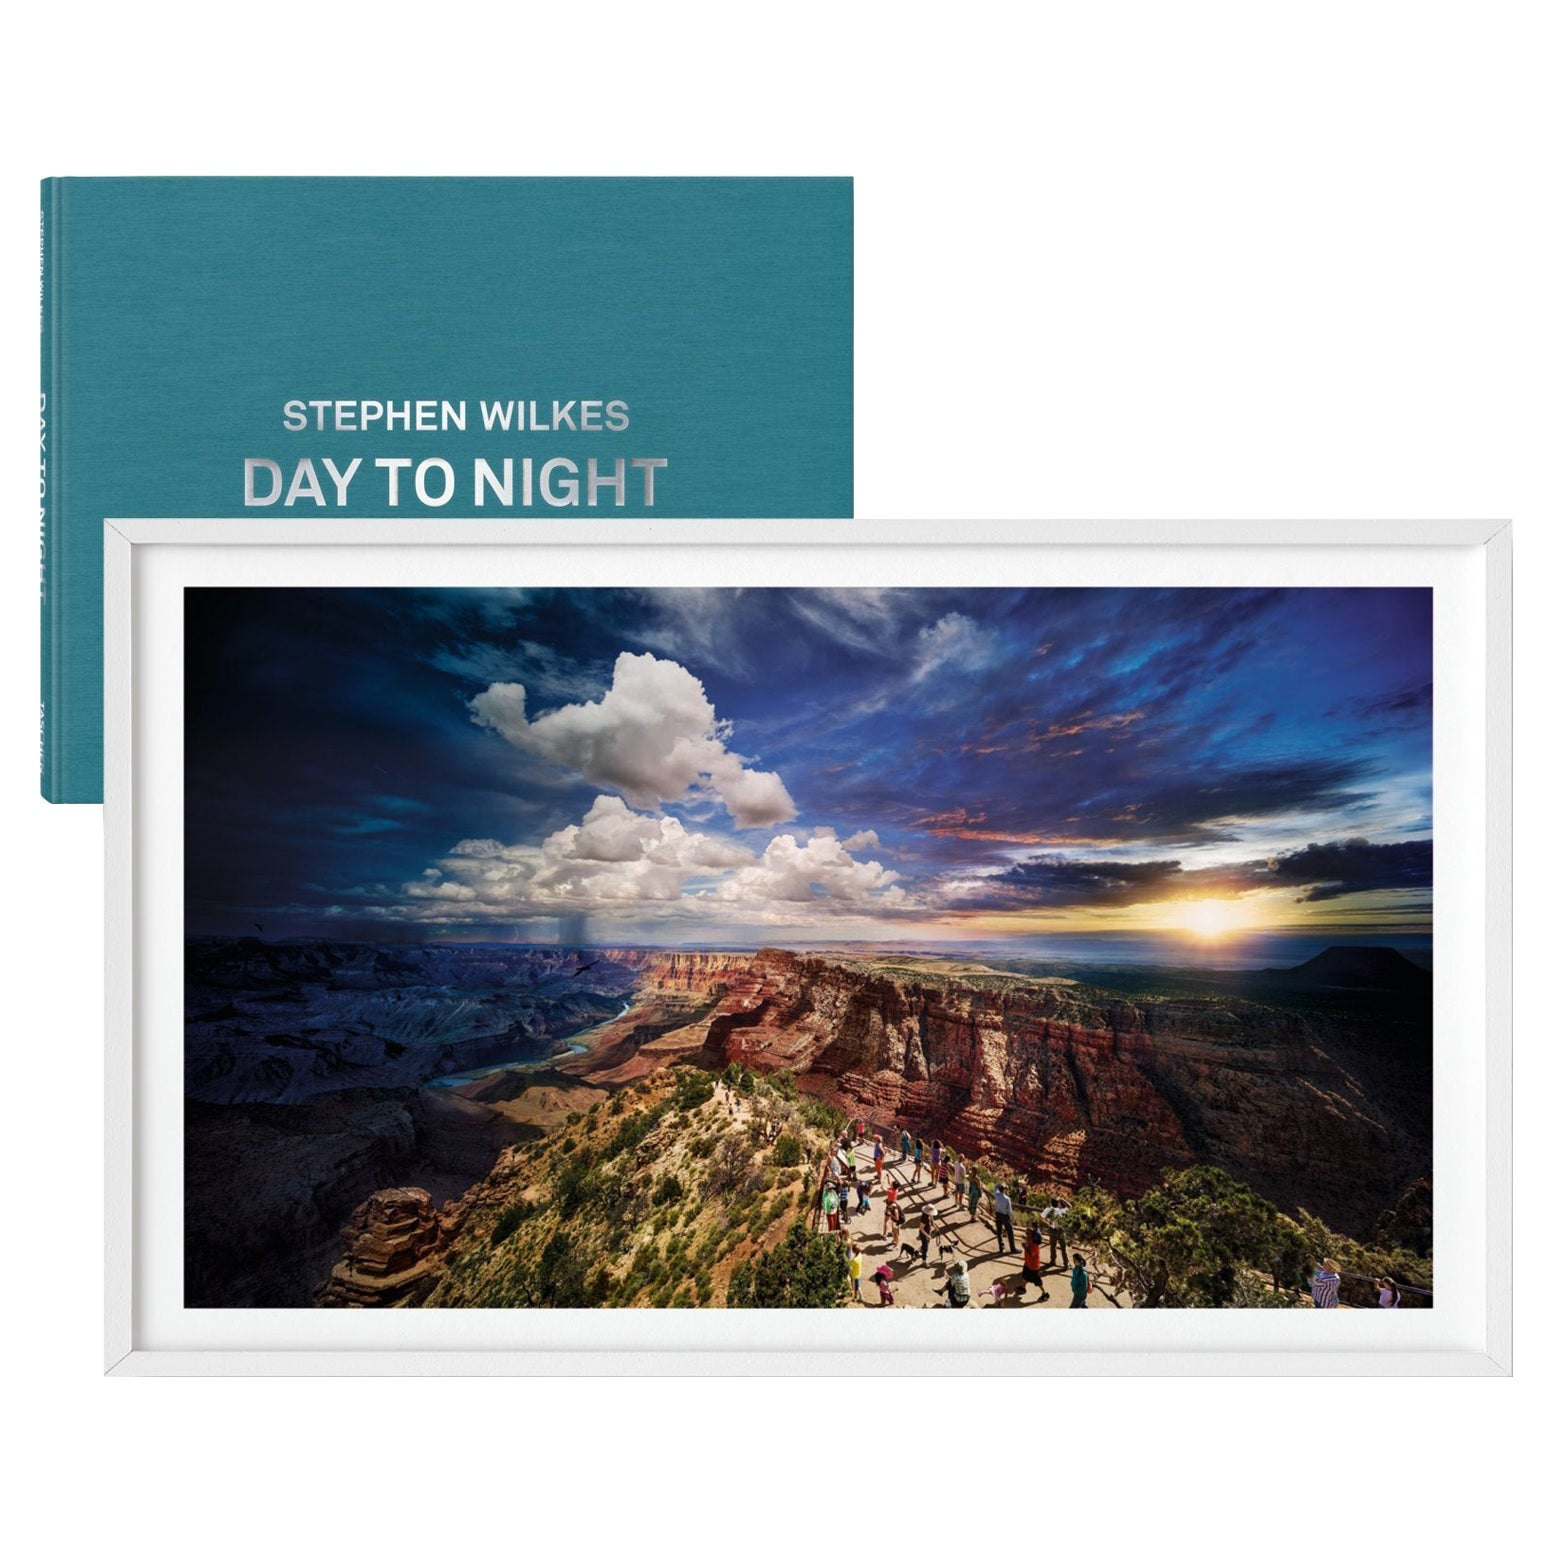 Stephen Wilkes, Day to Night, Art Edition No. 101-200 Grand Canyon, Arizona